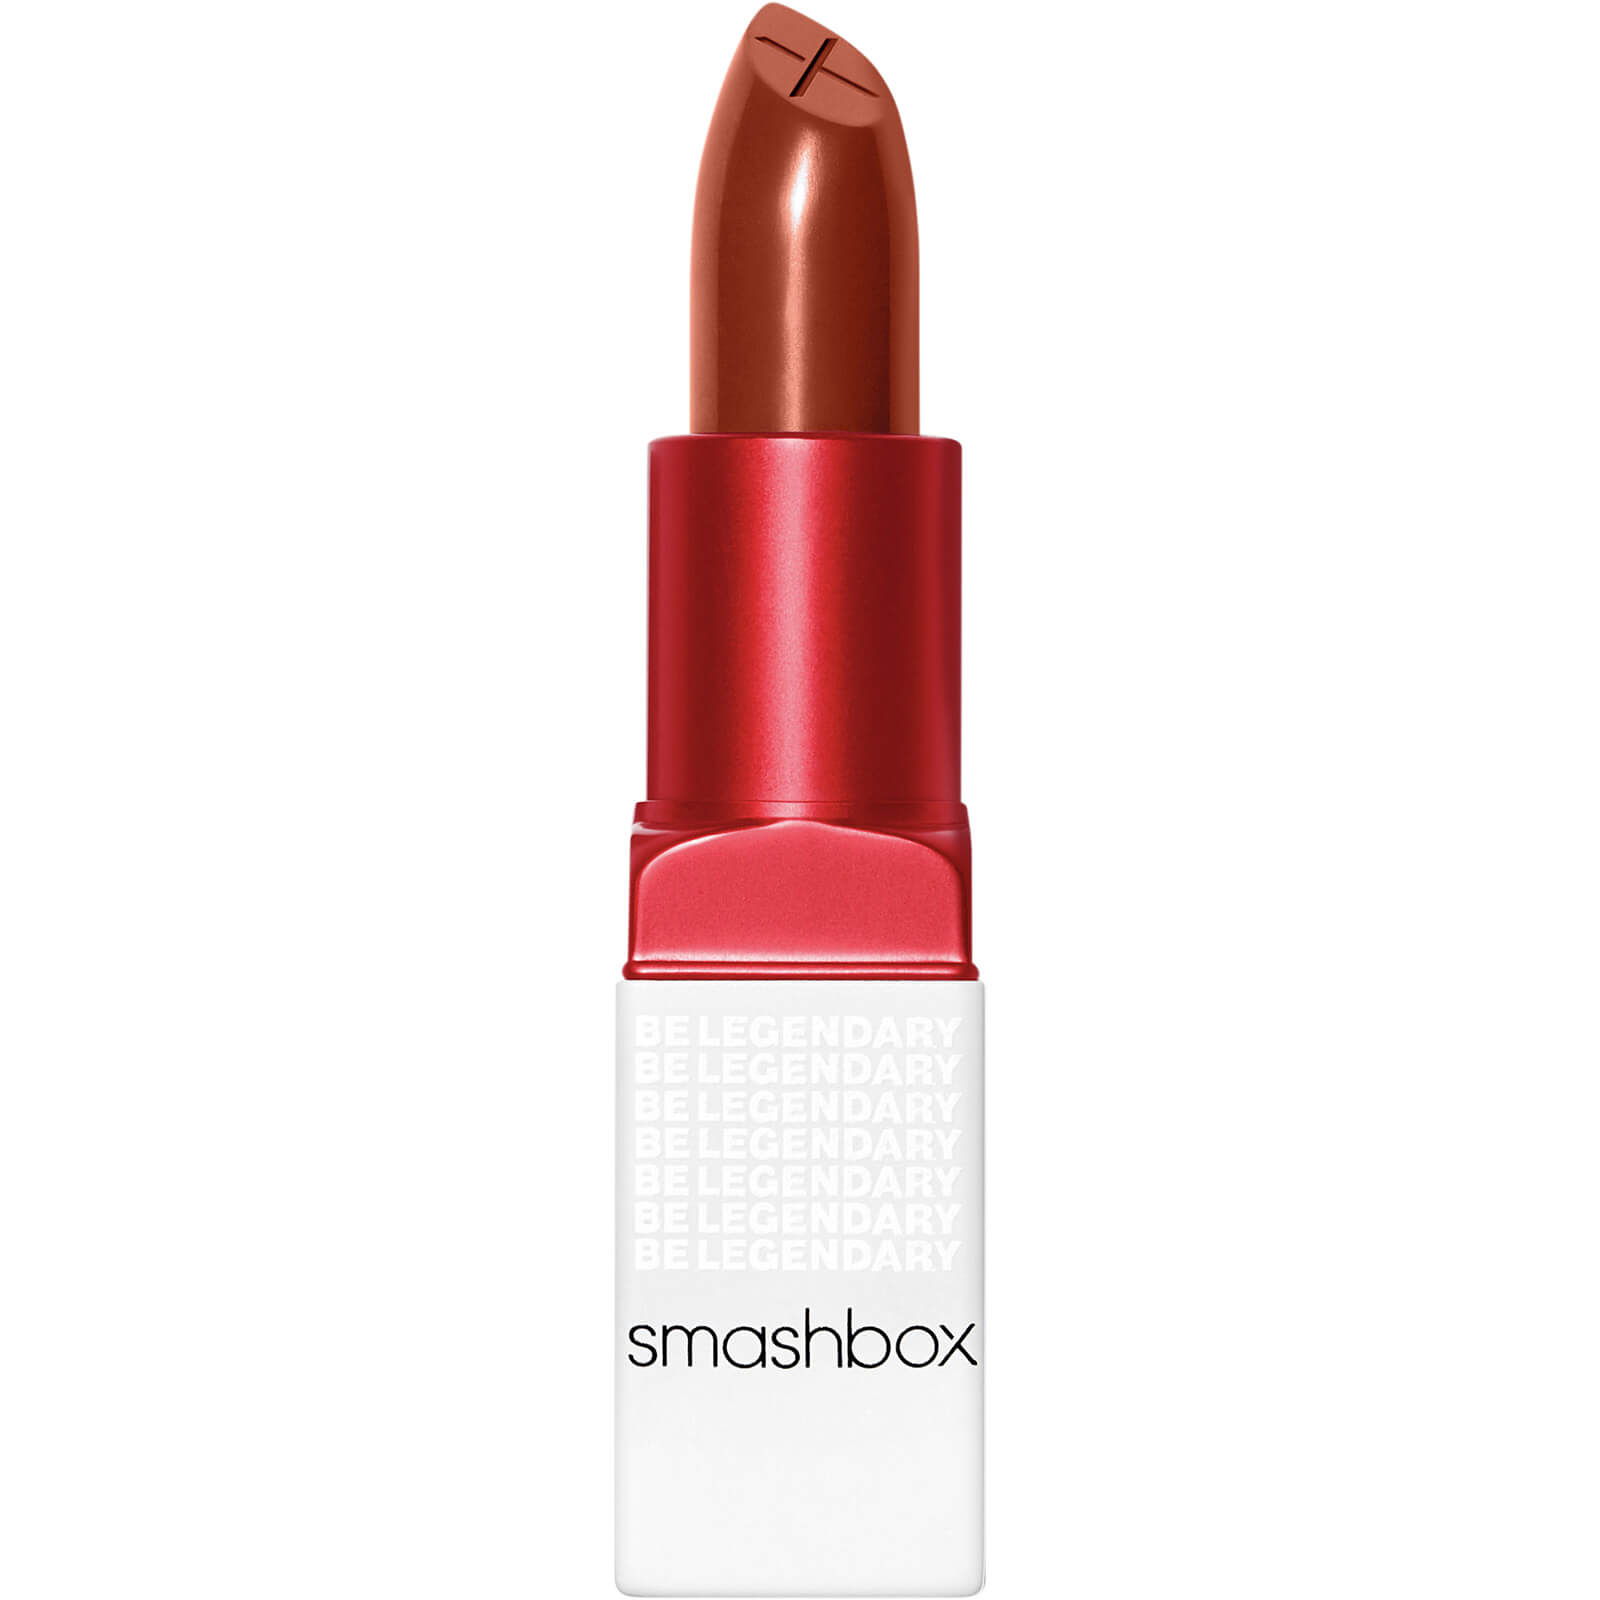 Купить Smashbox Be Legendary Prime and Plush Lipstick 3.4g (Various Shades) - Burnt Orange